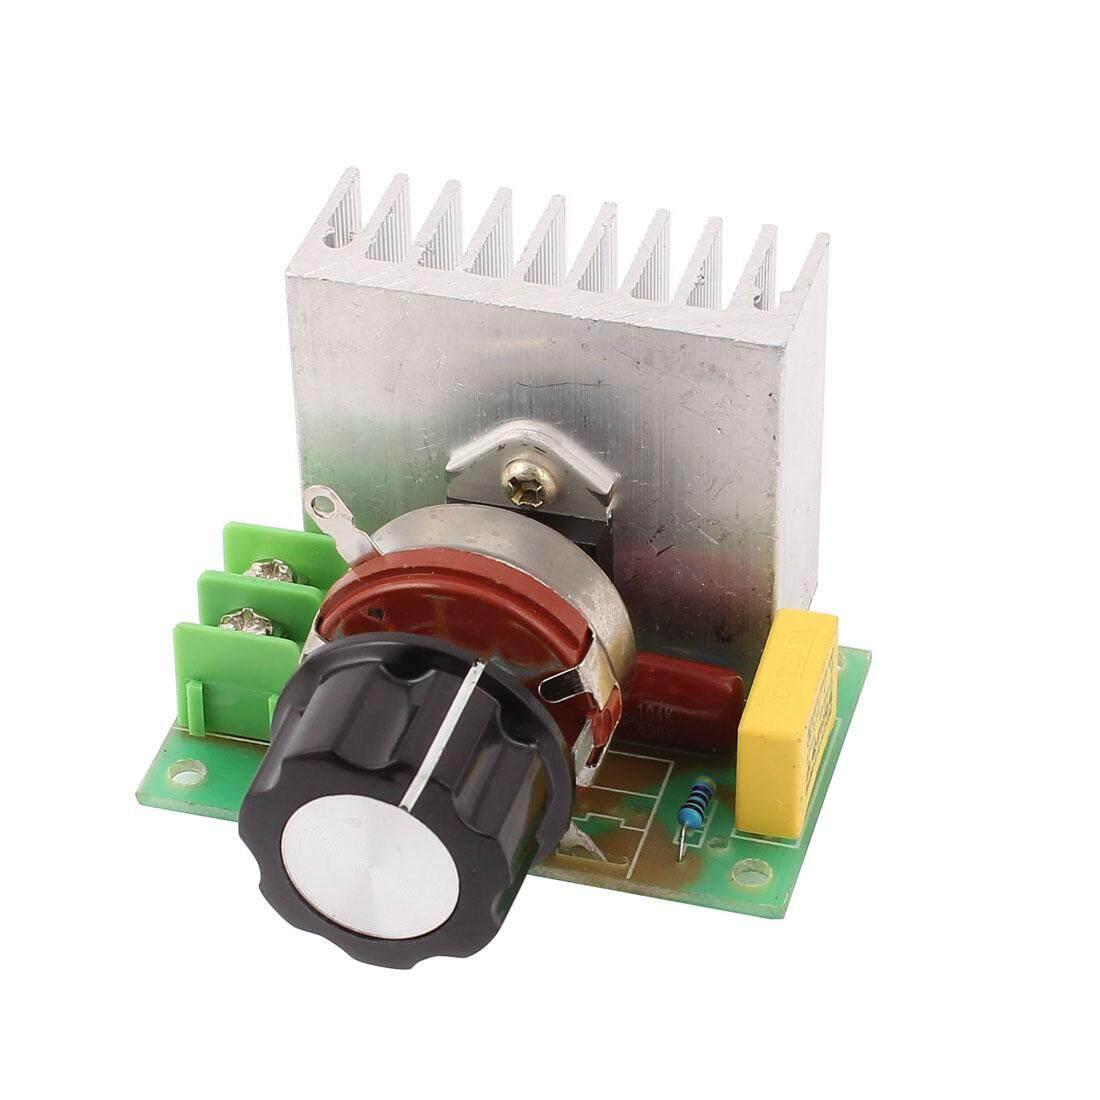 3800w Scr 3160174 Electronic Voltage Regulator Dimming Dimmers Speed Control Nankai Pengatur Kecepatan Mesin Axa Ac220v Controlling Thermostat Regulatormyr86